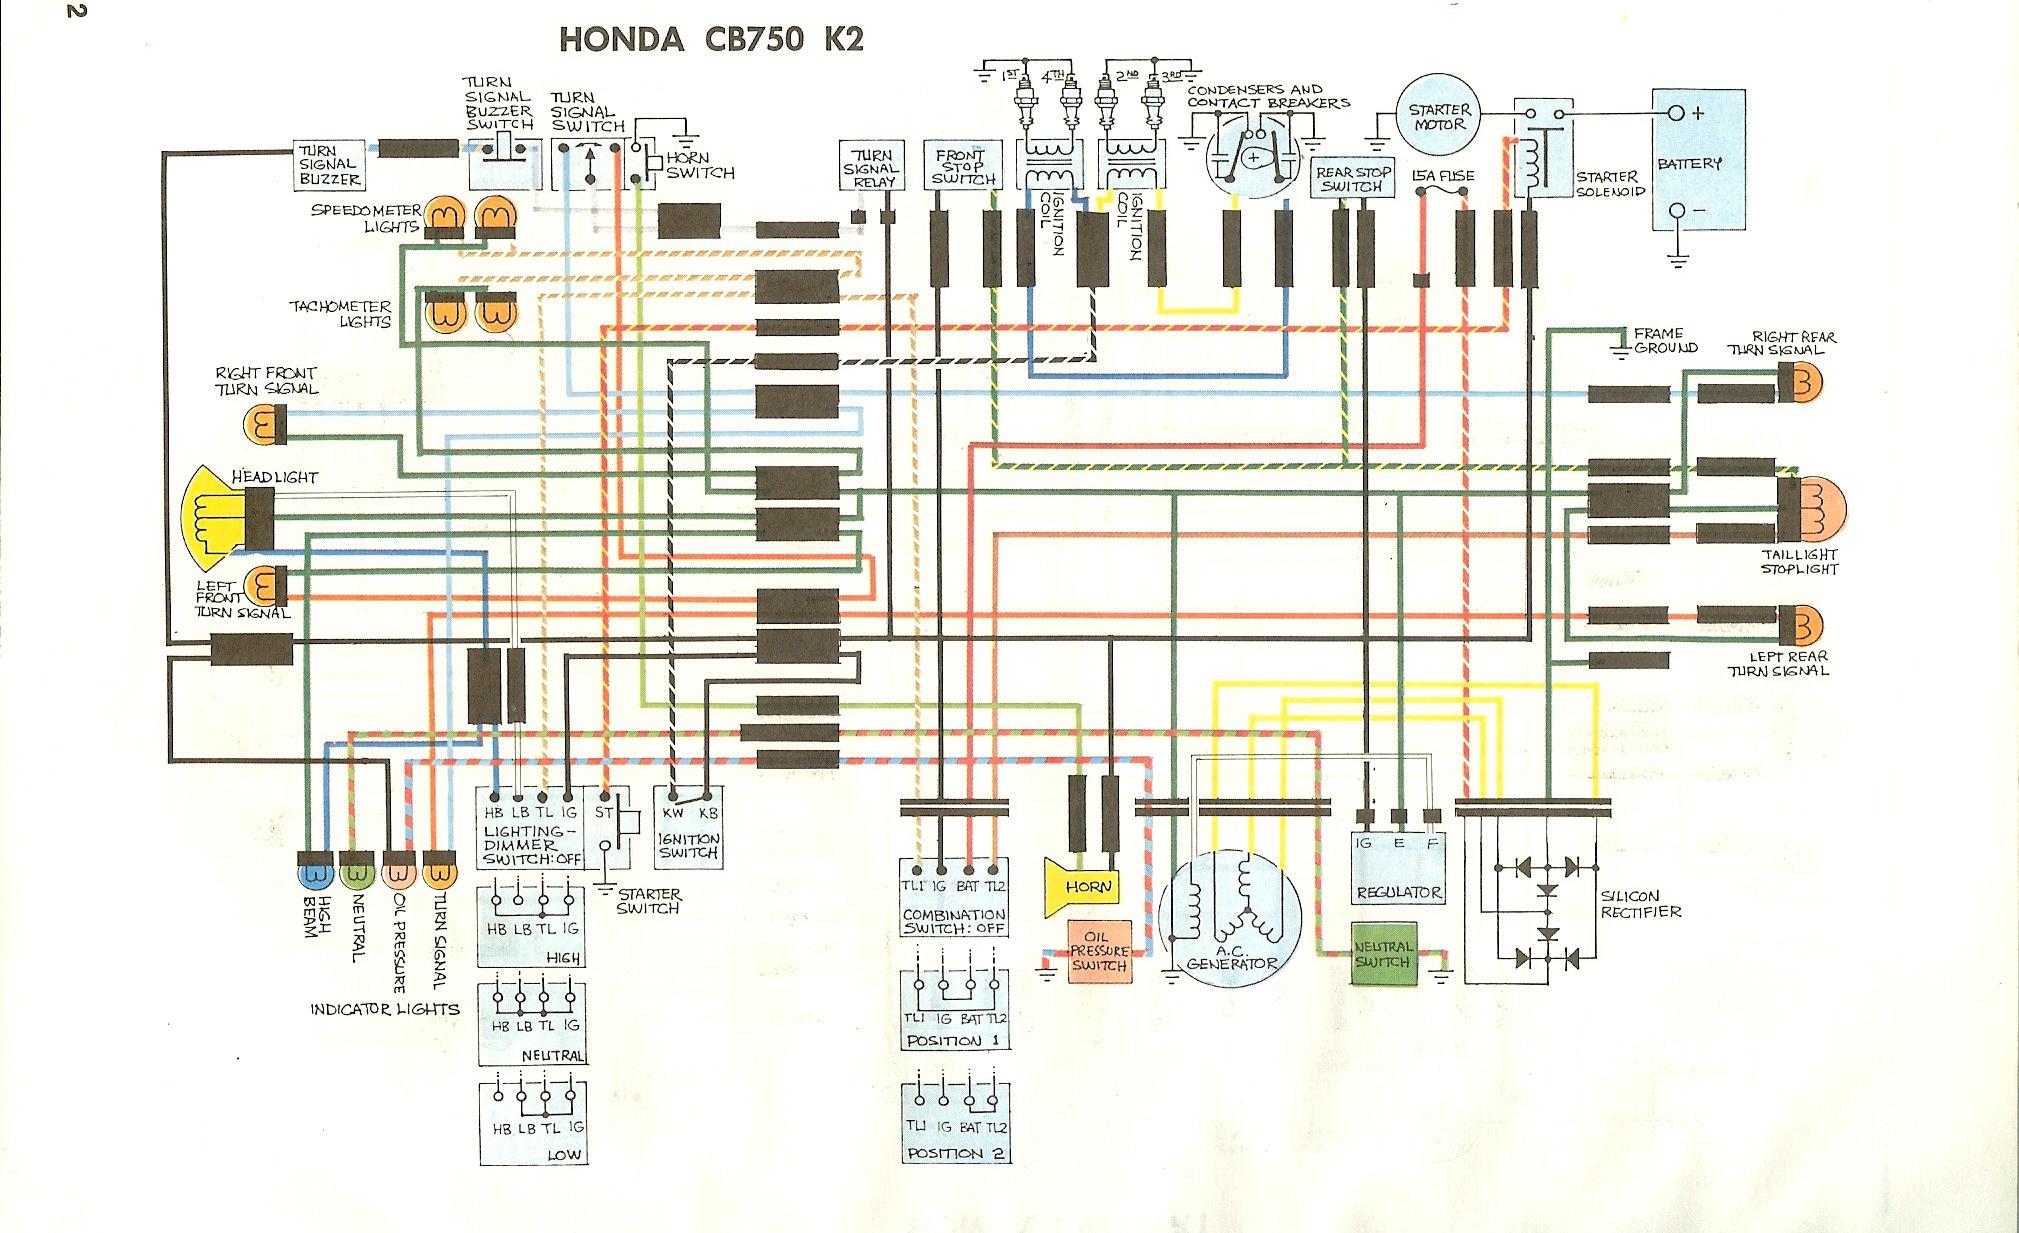 1978 honda cb750 wiring diagram 1978 honda ct90 wiring diagram 2010 Honda Accord Ignition Wiring Diagram Chinese Mini Chopper Wiring Diagram 1978 honda z50 wiring diagram